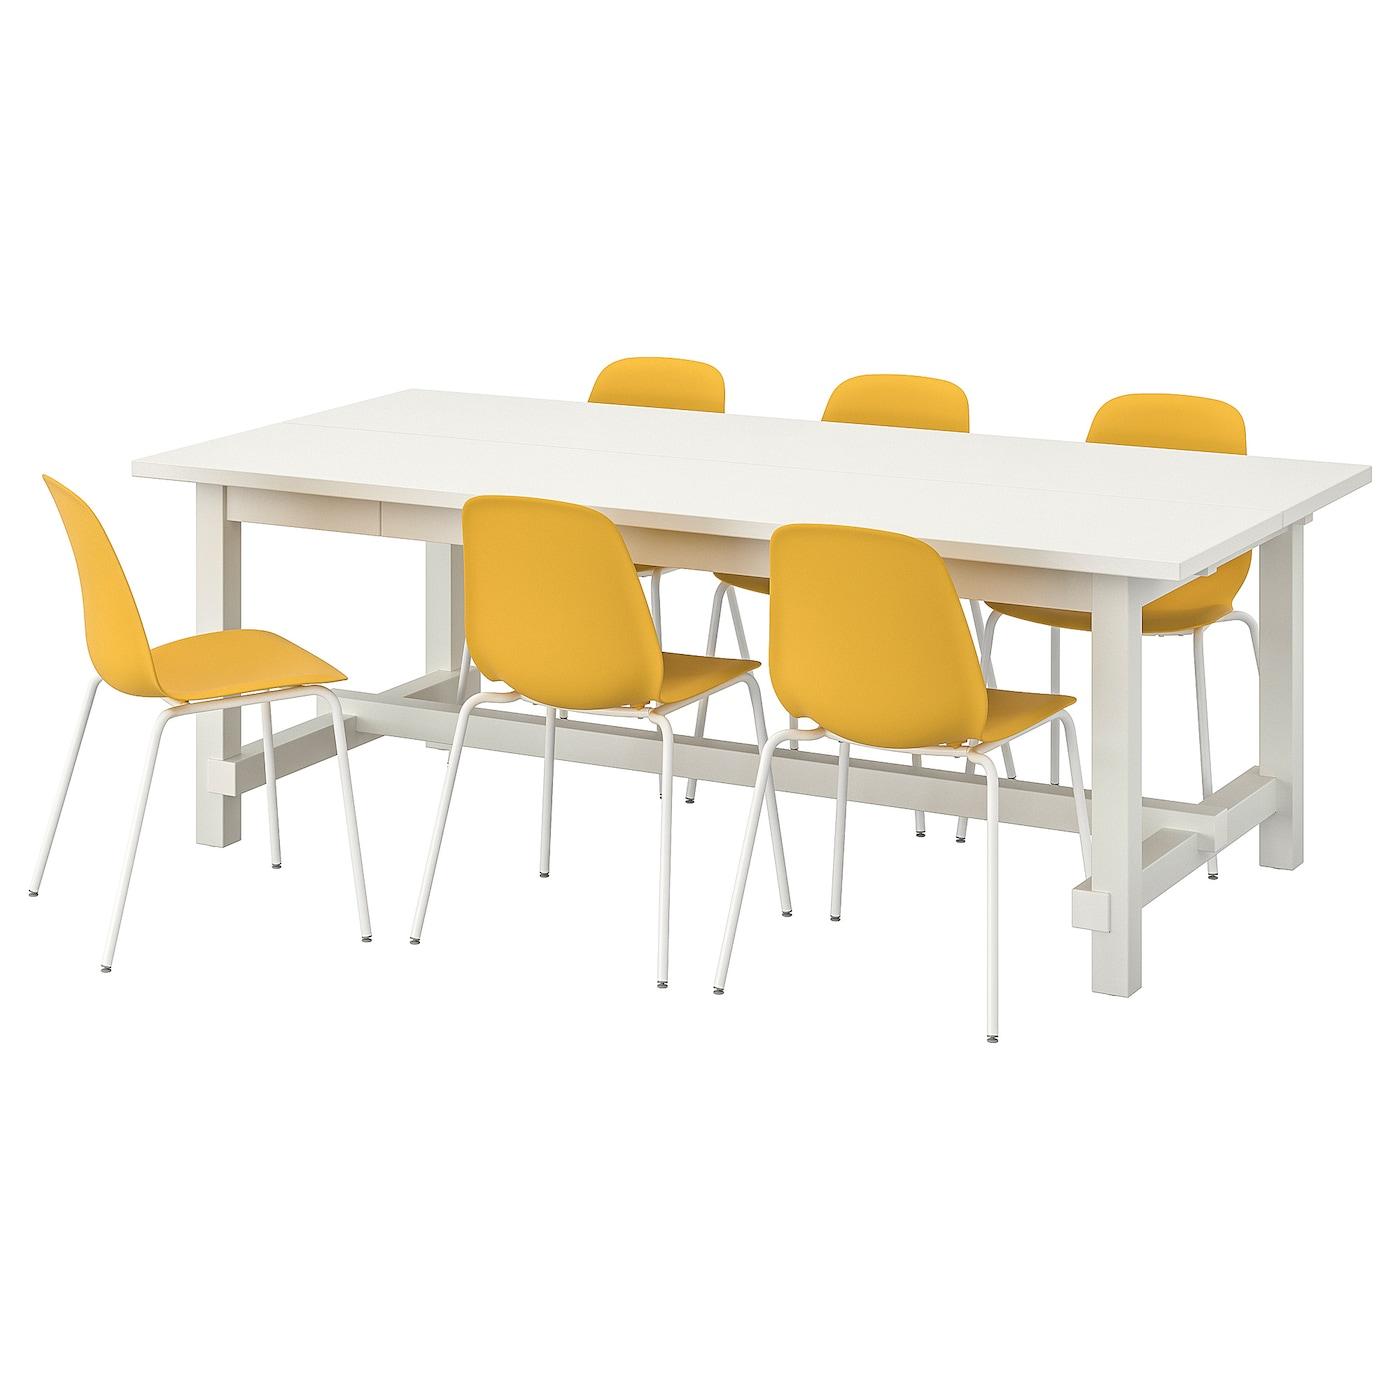 NORDVIKEN LEIFARNE Bord och 6 stolar vitmörkgul vit 210289x105 cm